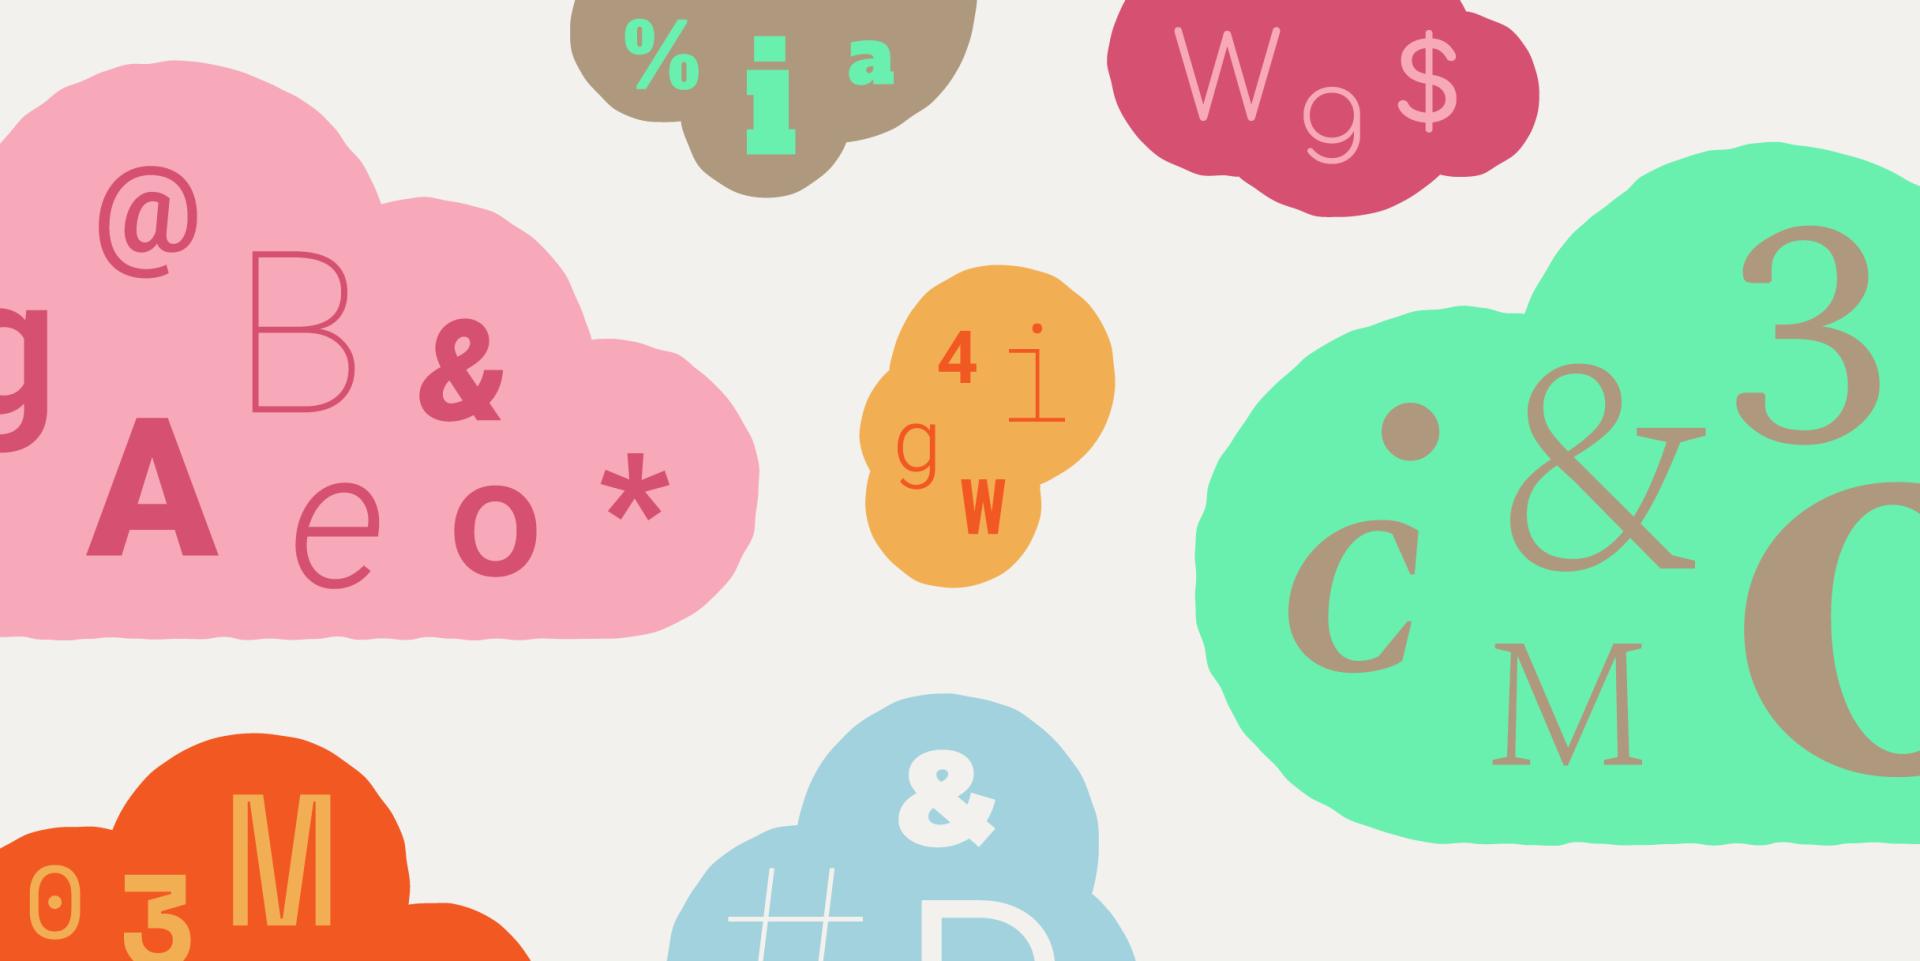 一份给 Android 开发者的字体排印指南